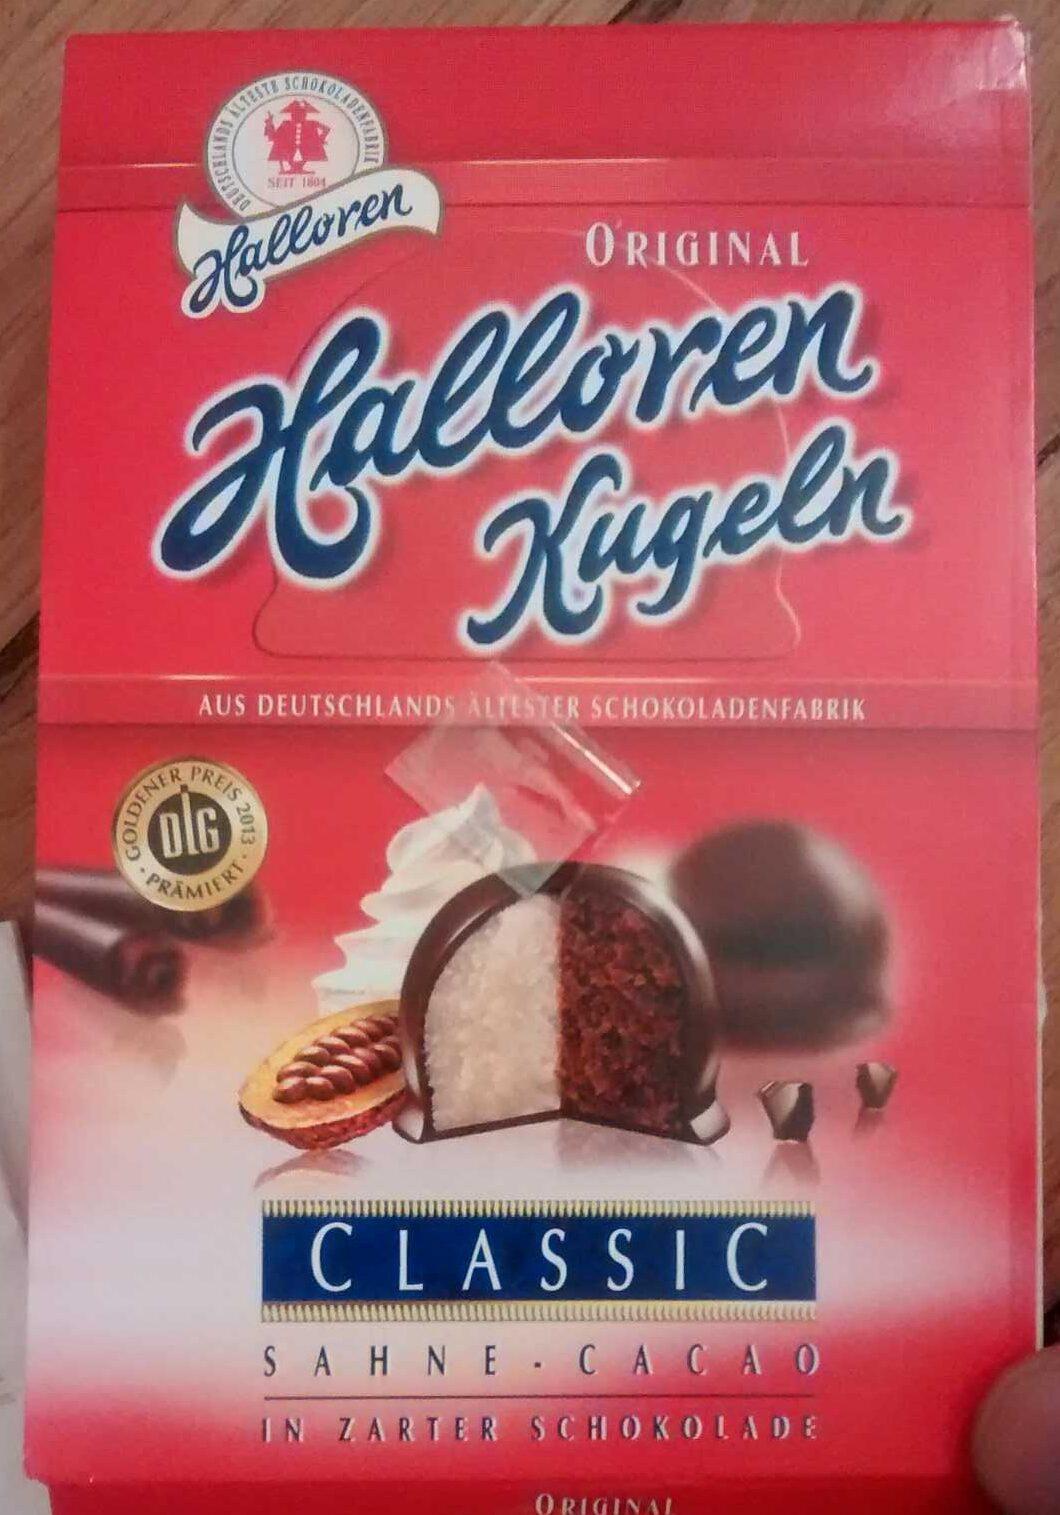 Halloren Kugeln Classic Sahne-cacao - Produit